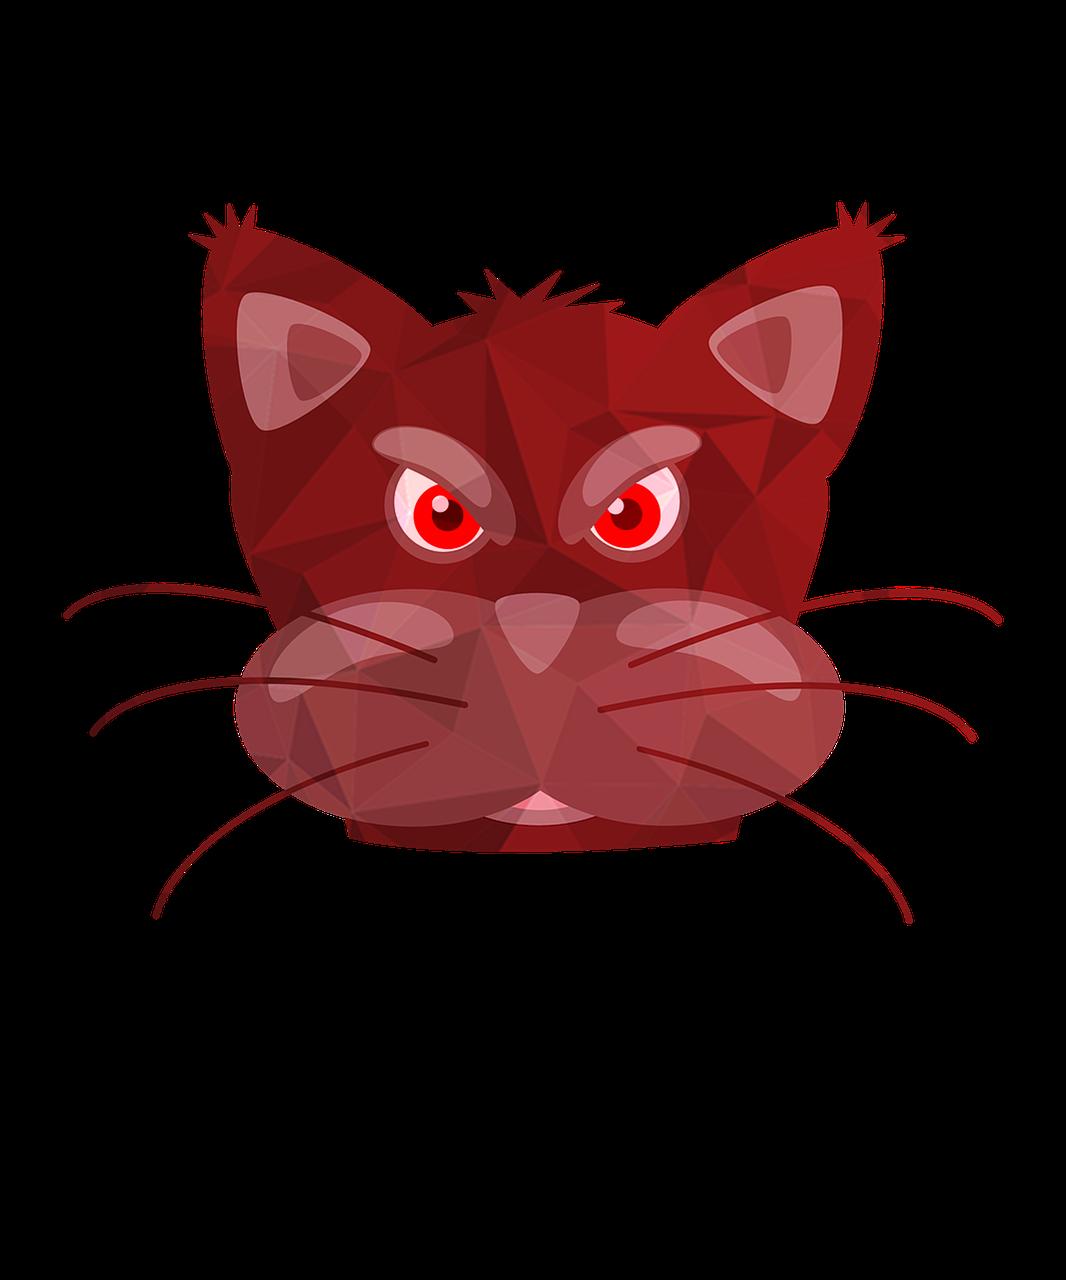 cats, red cat, pink cat-3238608.jpg